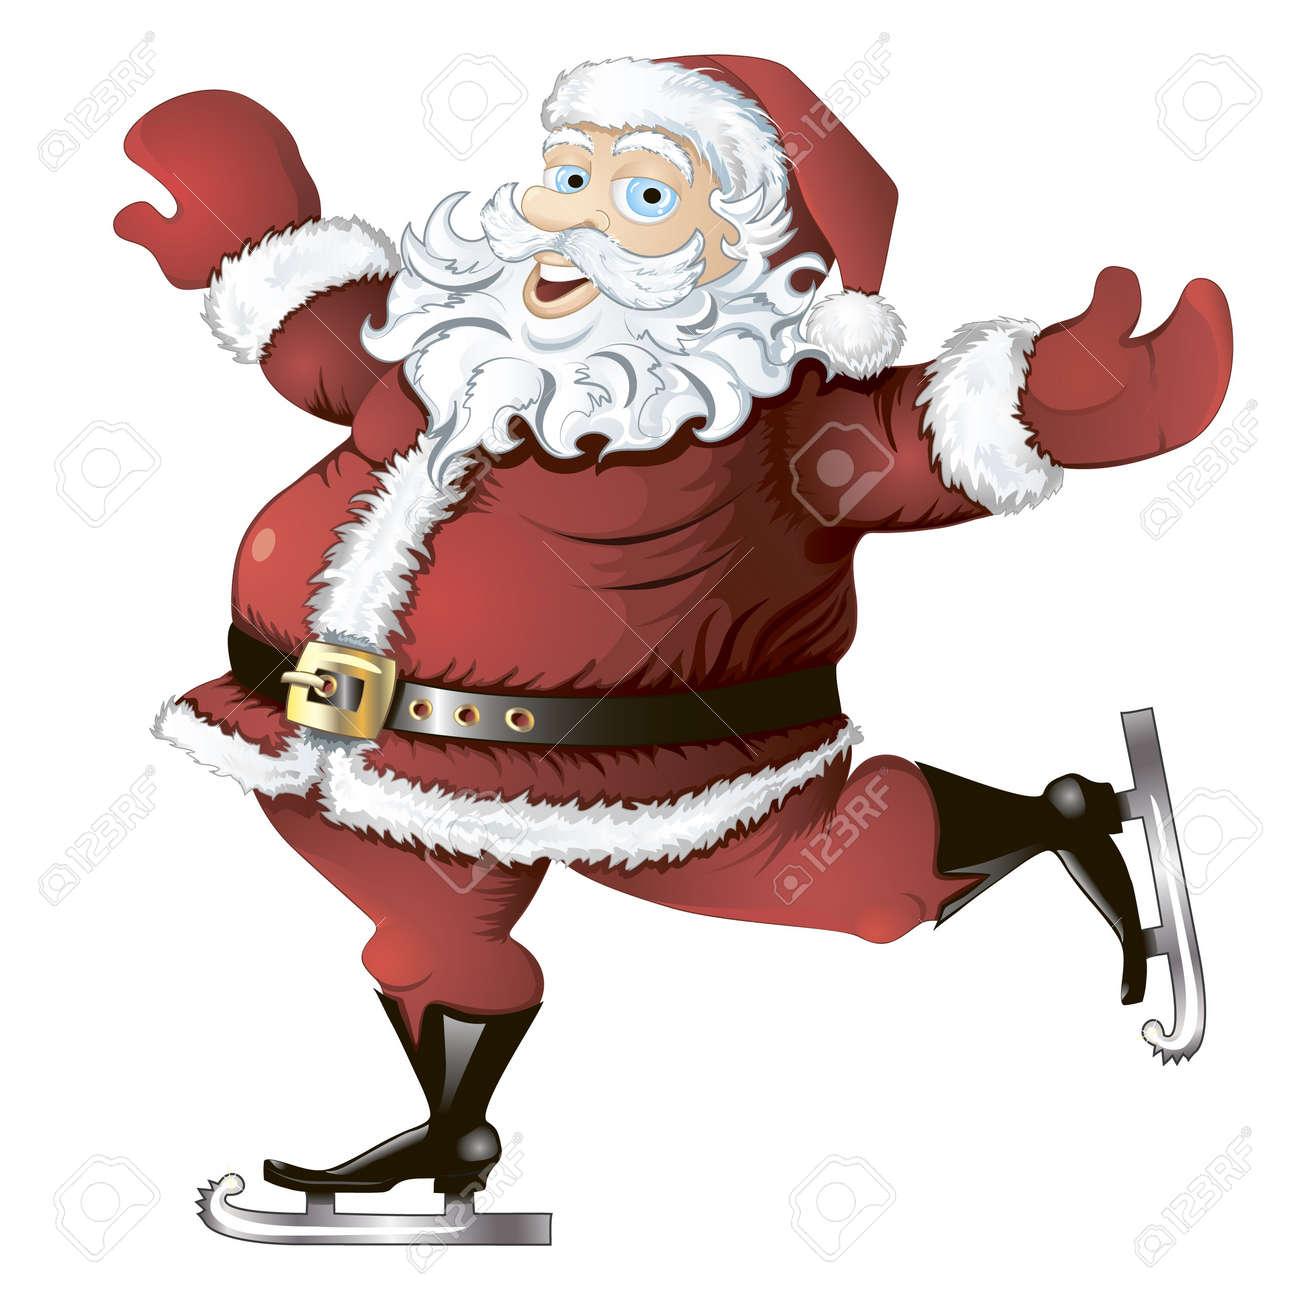 isolated cartoon illustration of skating Santa Claus - 10928325